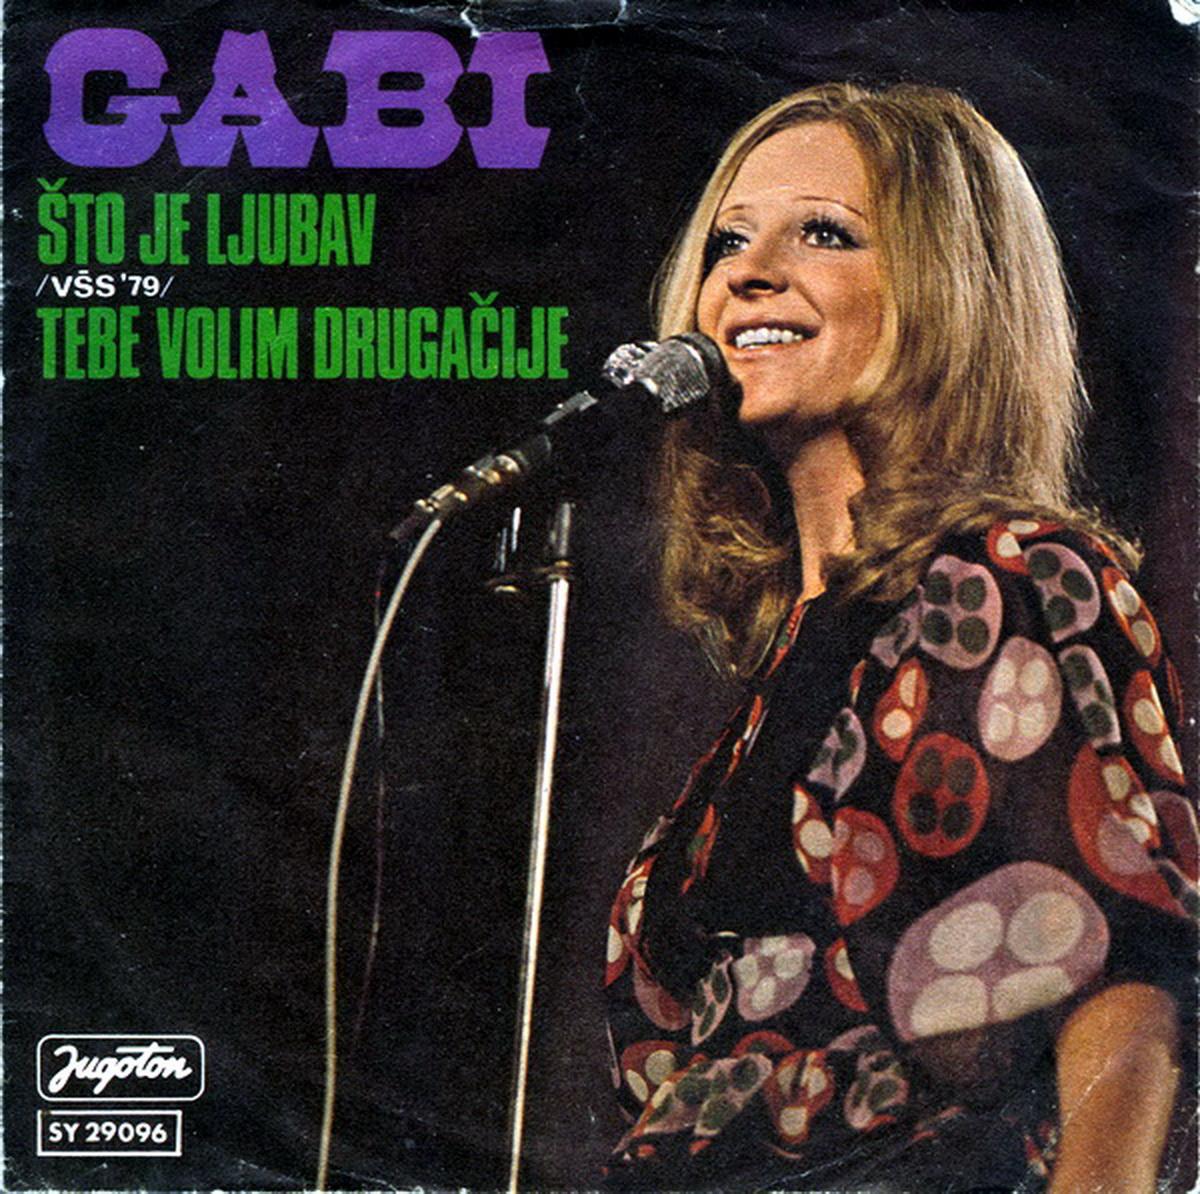 Gabi Novak 1979 Sto je ljubav b